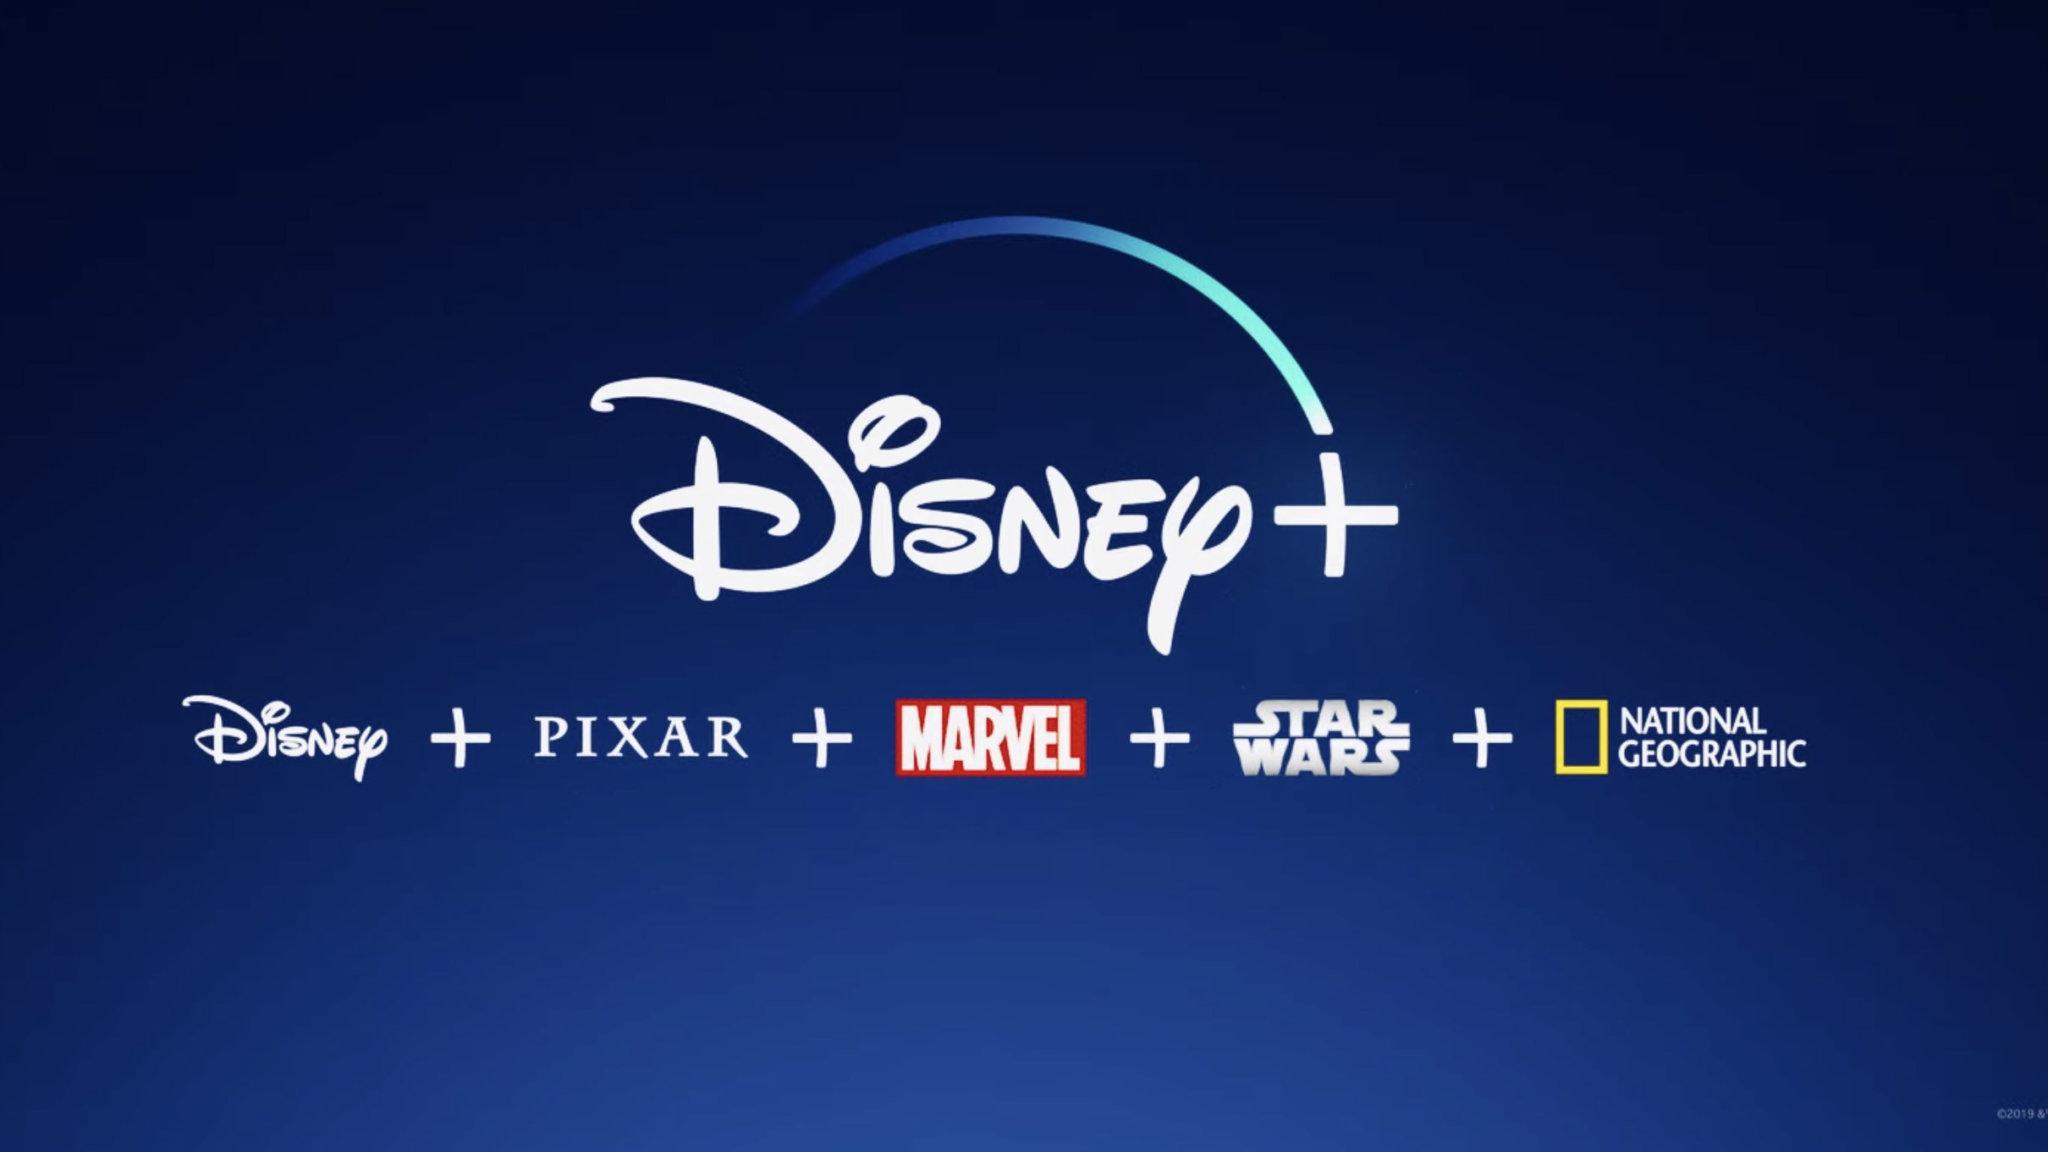 Disney+ April Releases